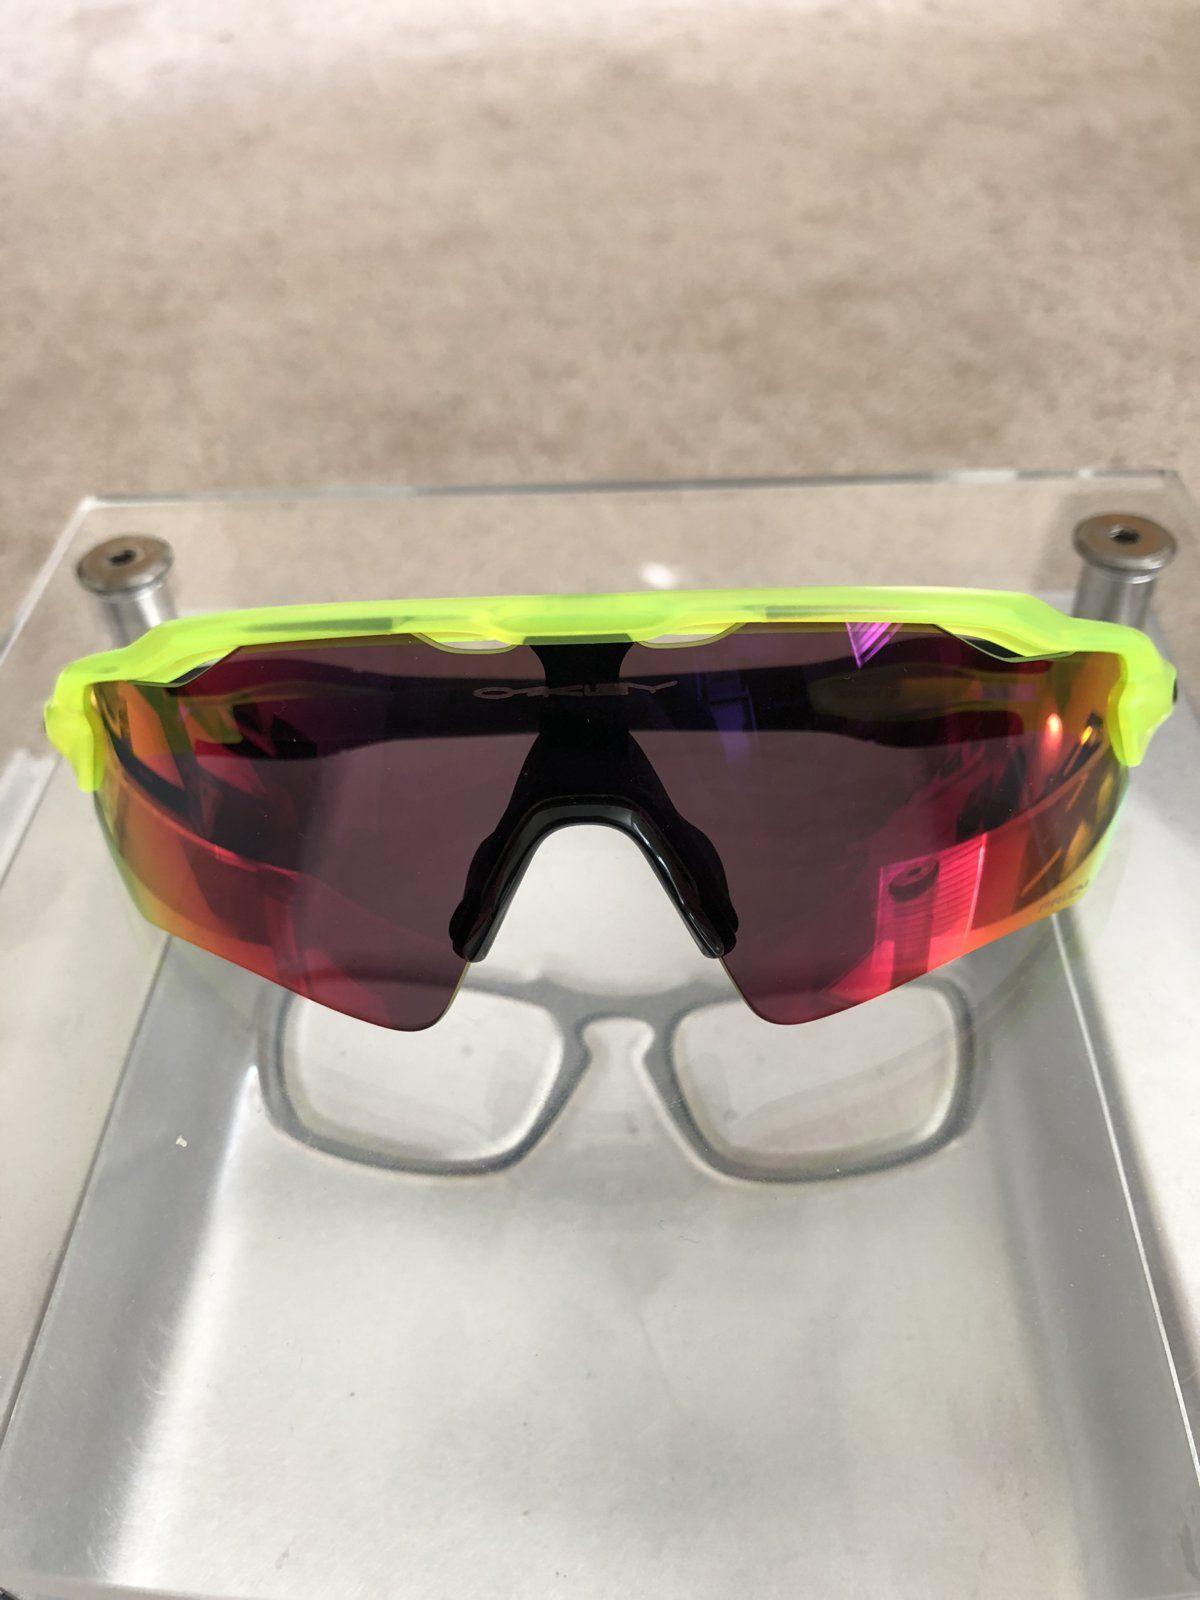 15 pairs for sale (new stuff-part 1) - 651F41C0-765D-425A-AACC-353DB5834E20.jpeg